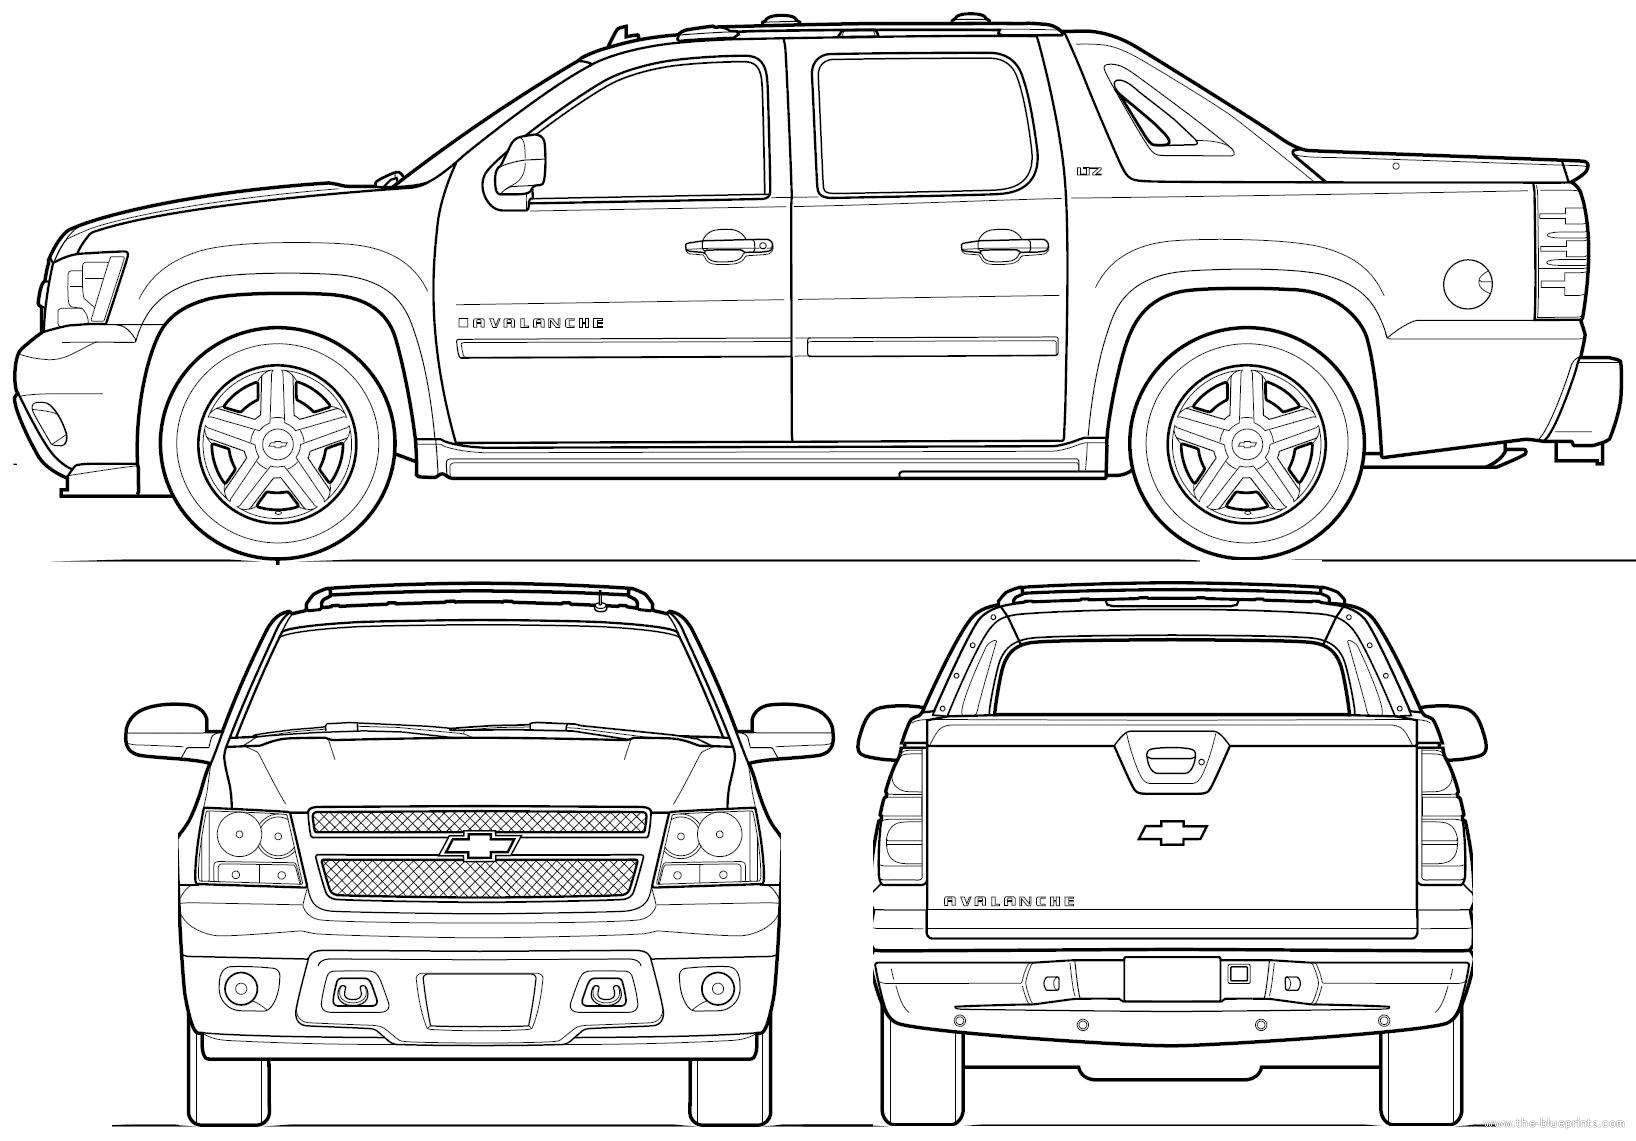 Blueprints Gt Cars Gt Chevrolet Gt Chevrolet Avalanche